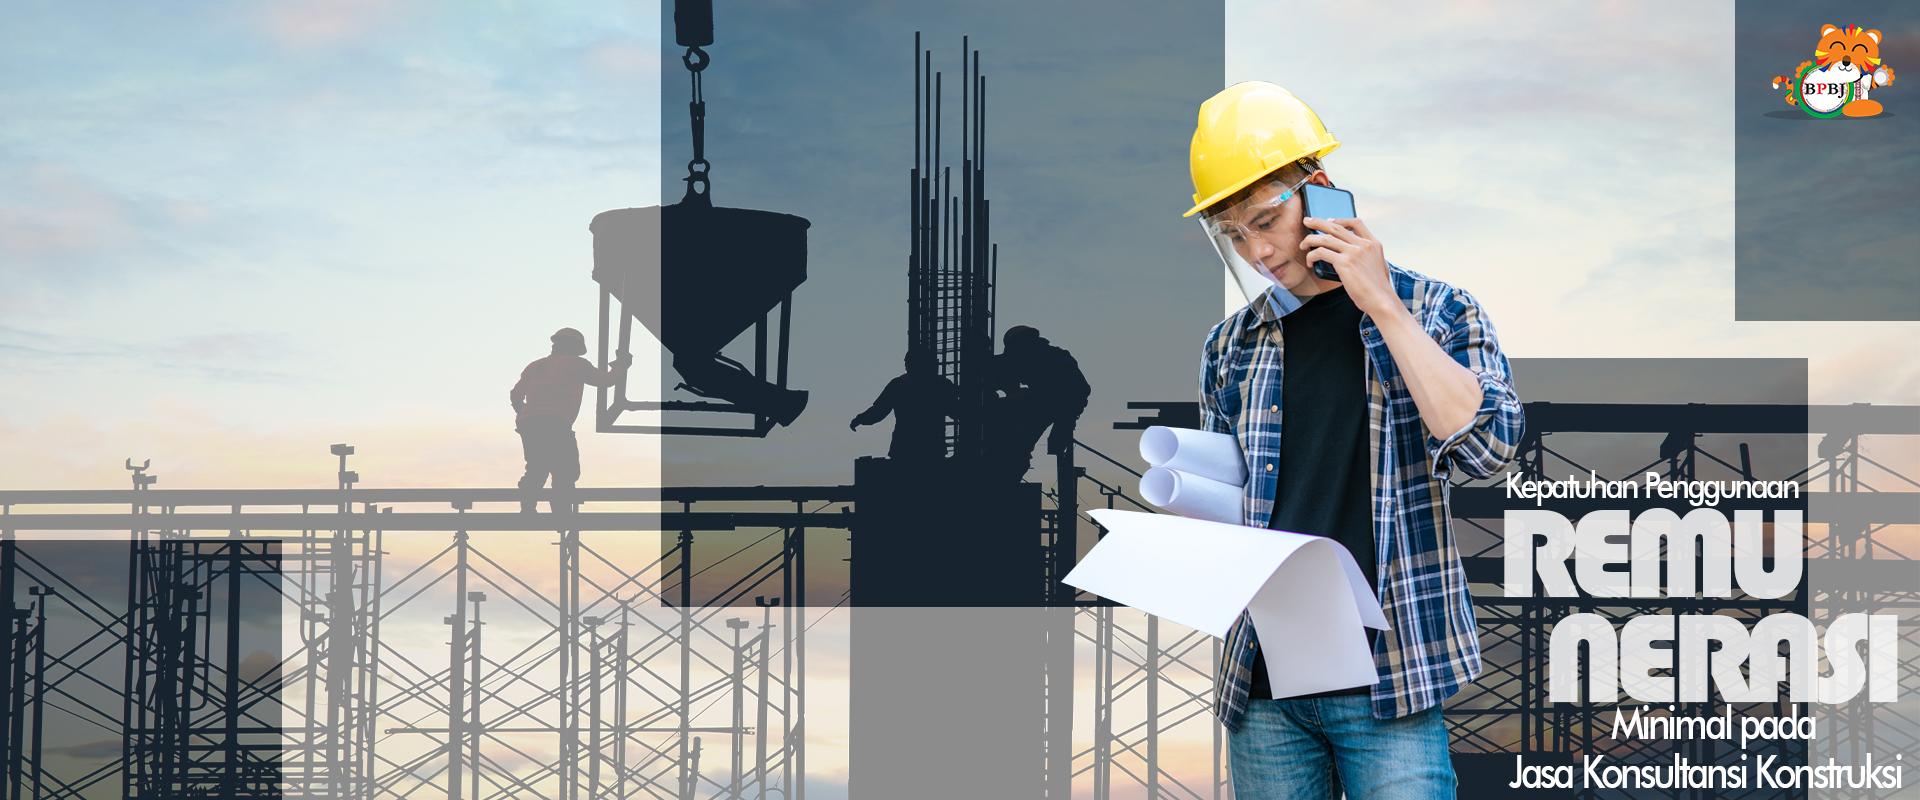 Kepatuhan Penggunaan Remunerasi Minimal Jasa Konsultansi Konstruksi